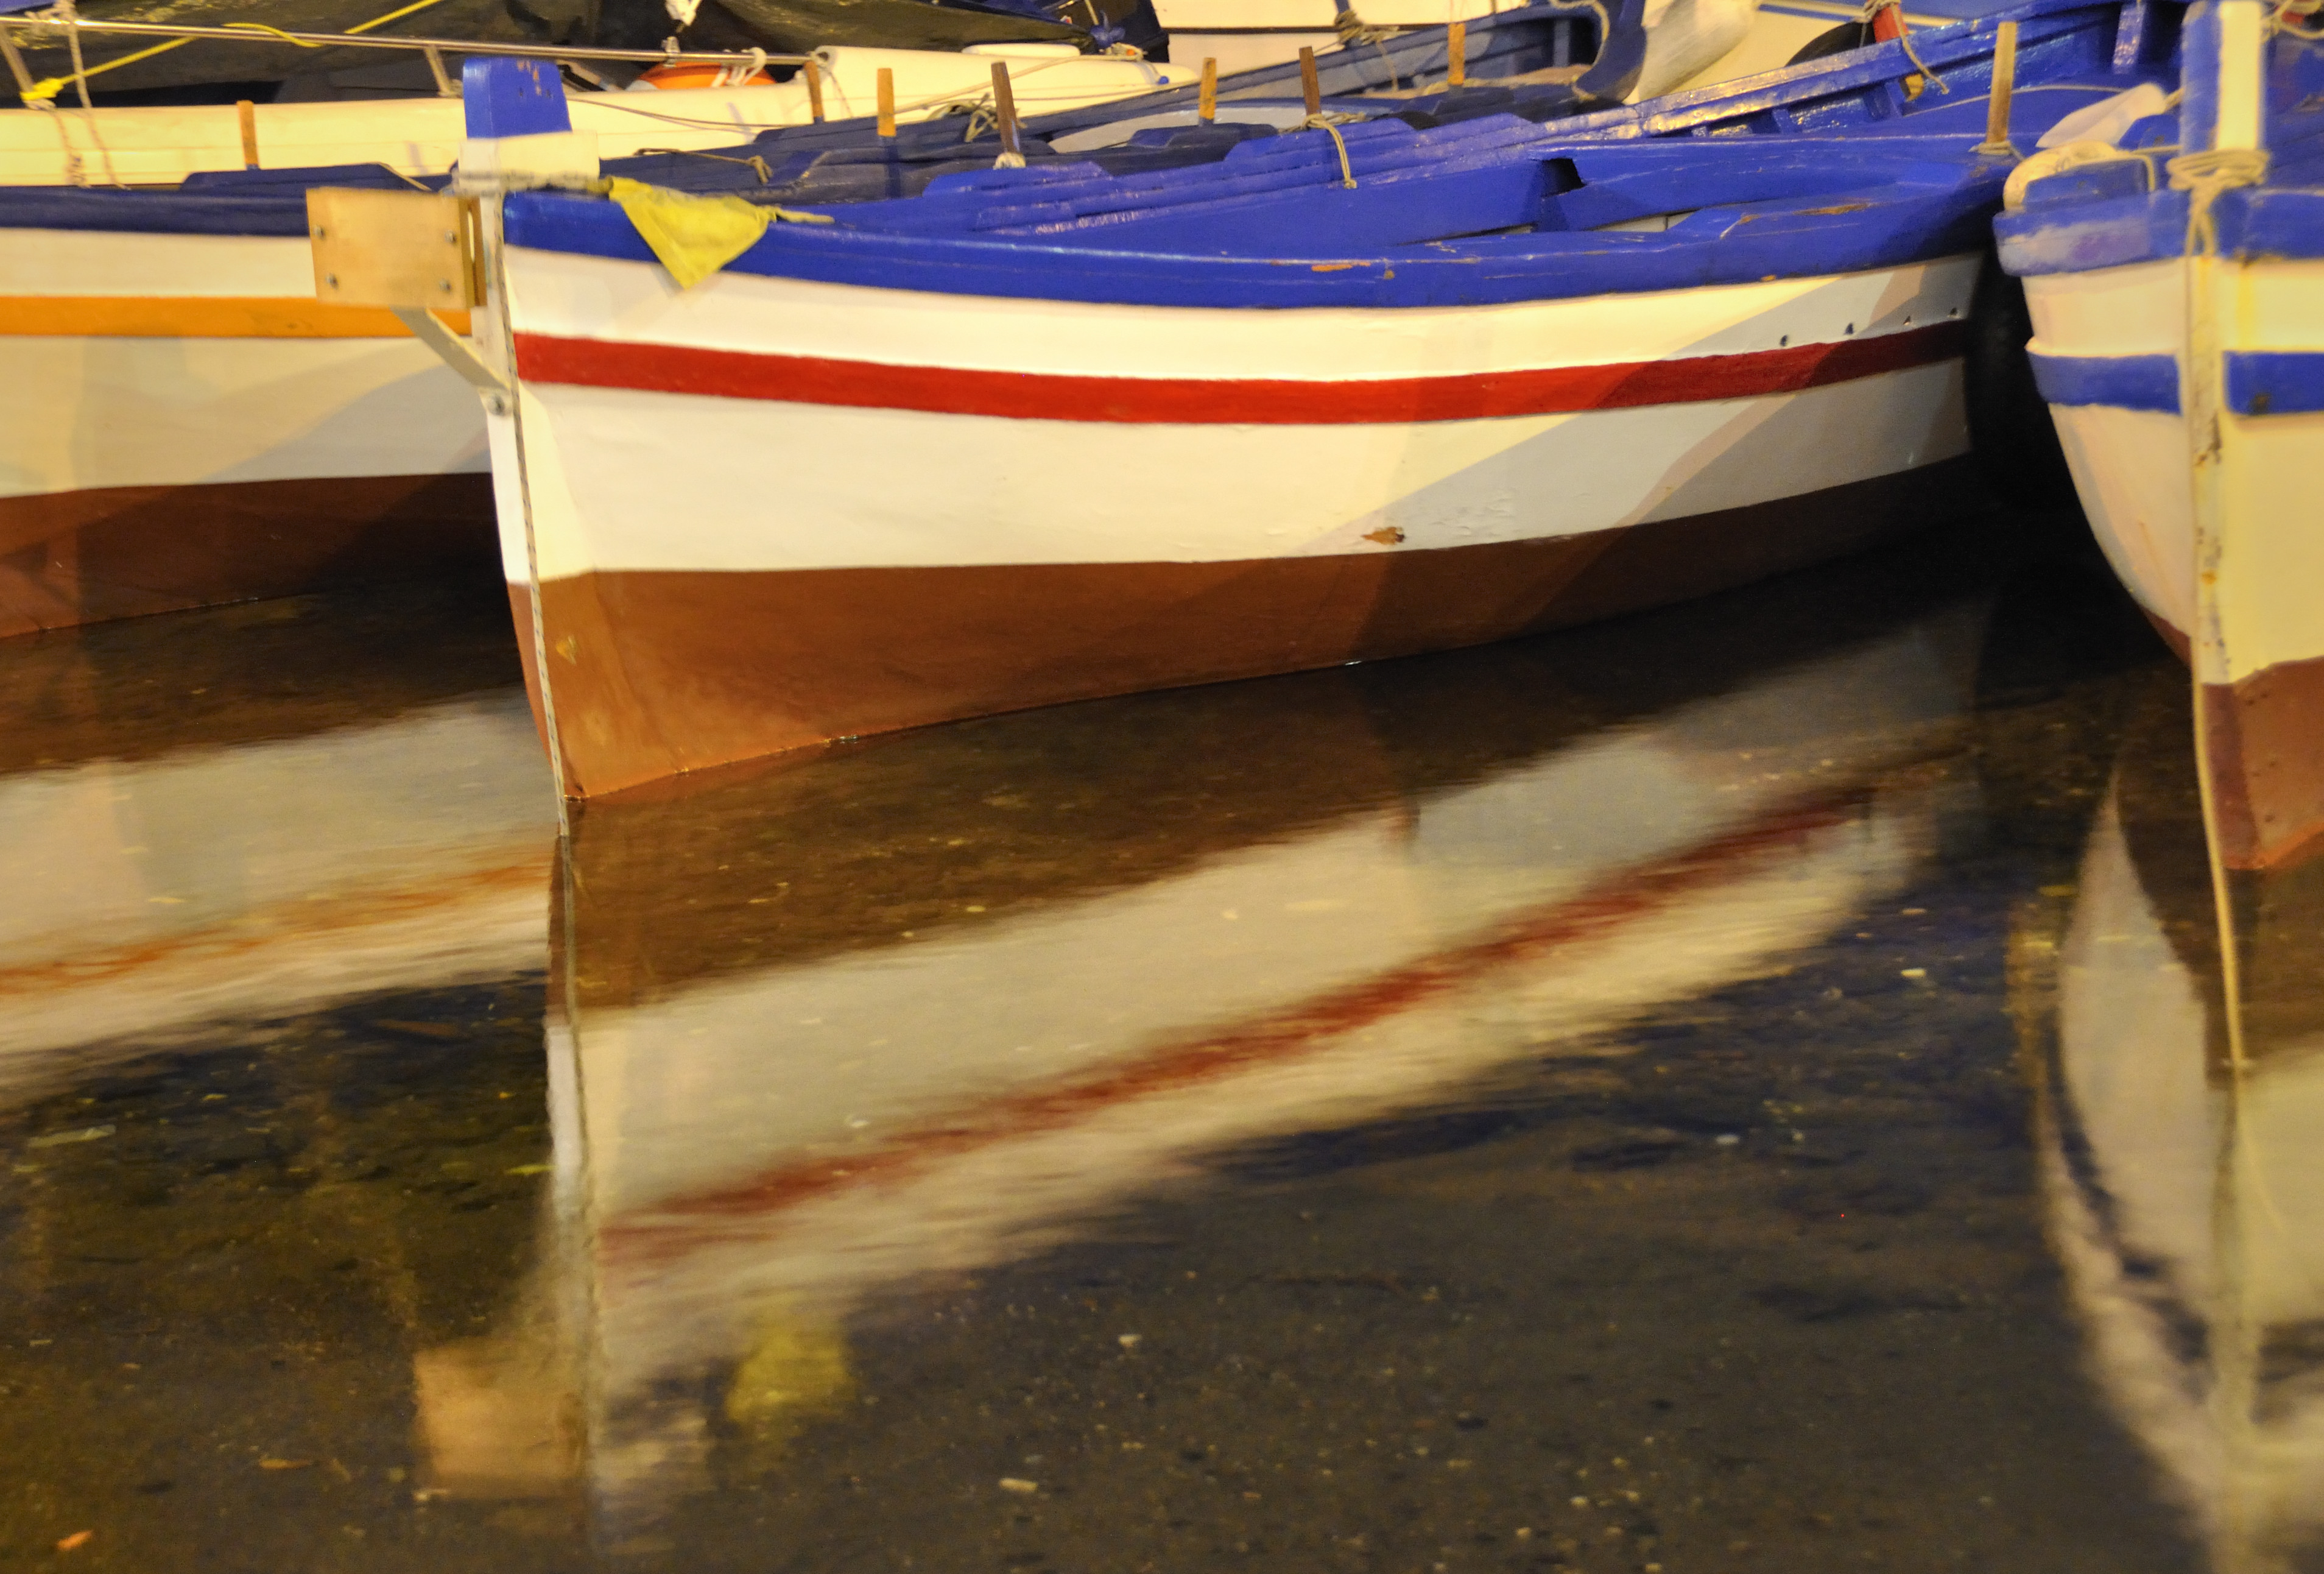 Yatching porto ulisse ognina catania sicilia taly - creative commons by gnuckx photo